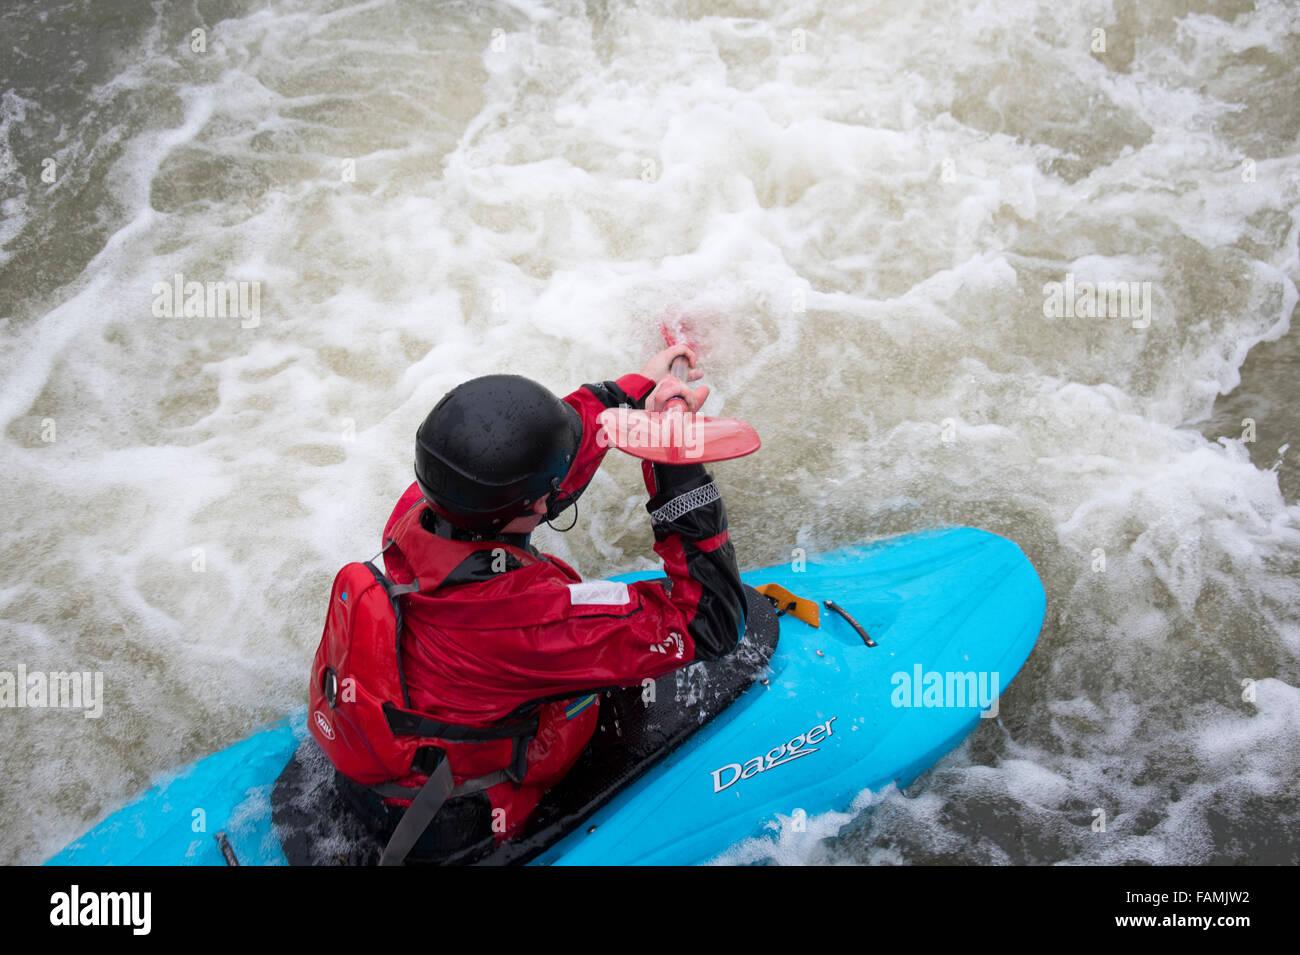 Woman kayaking in fast water - Stock Image